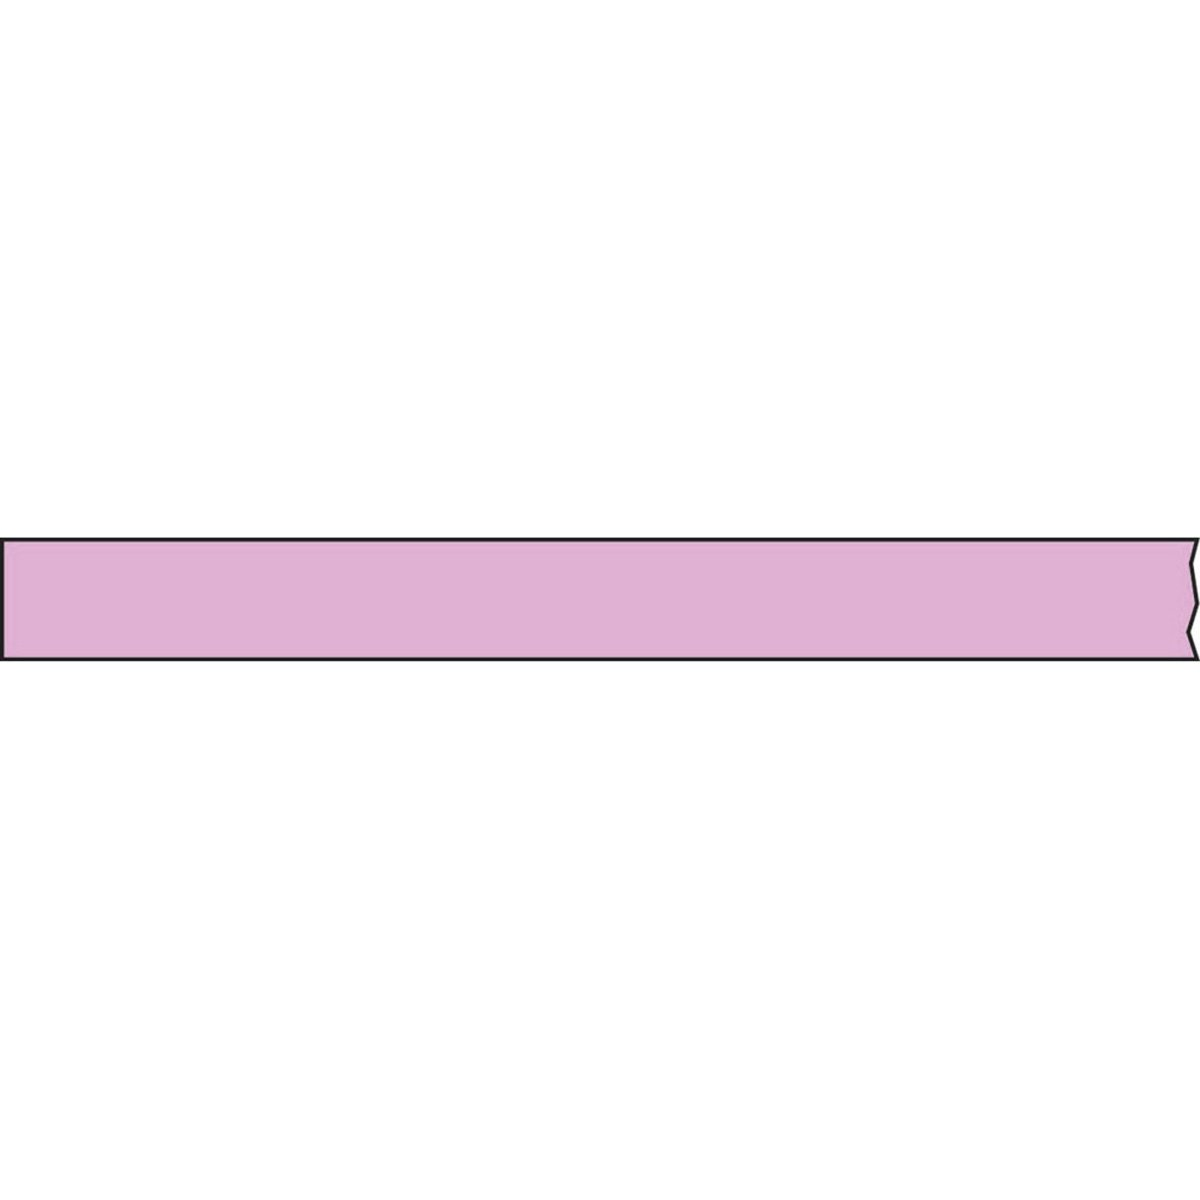 TIMETAPE T-1260-12 Tape, Removable, 3'' Core, 1/2'' x 2160'', Imprints Violet (Pack of 1)